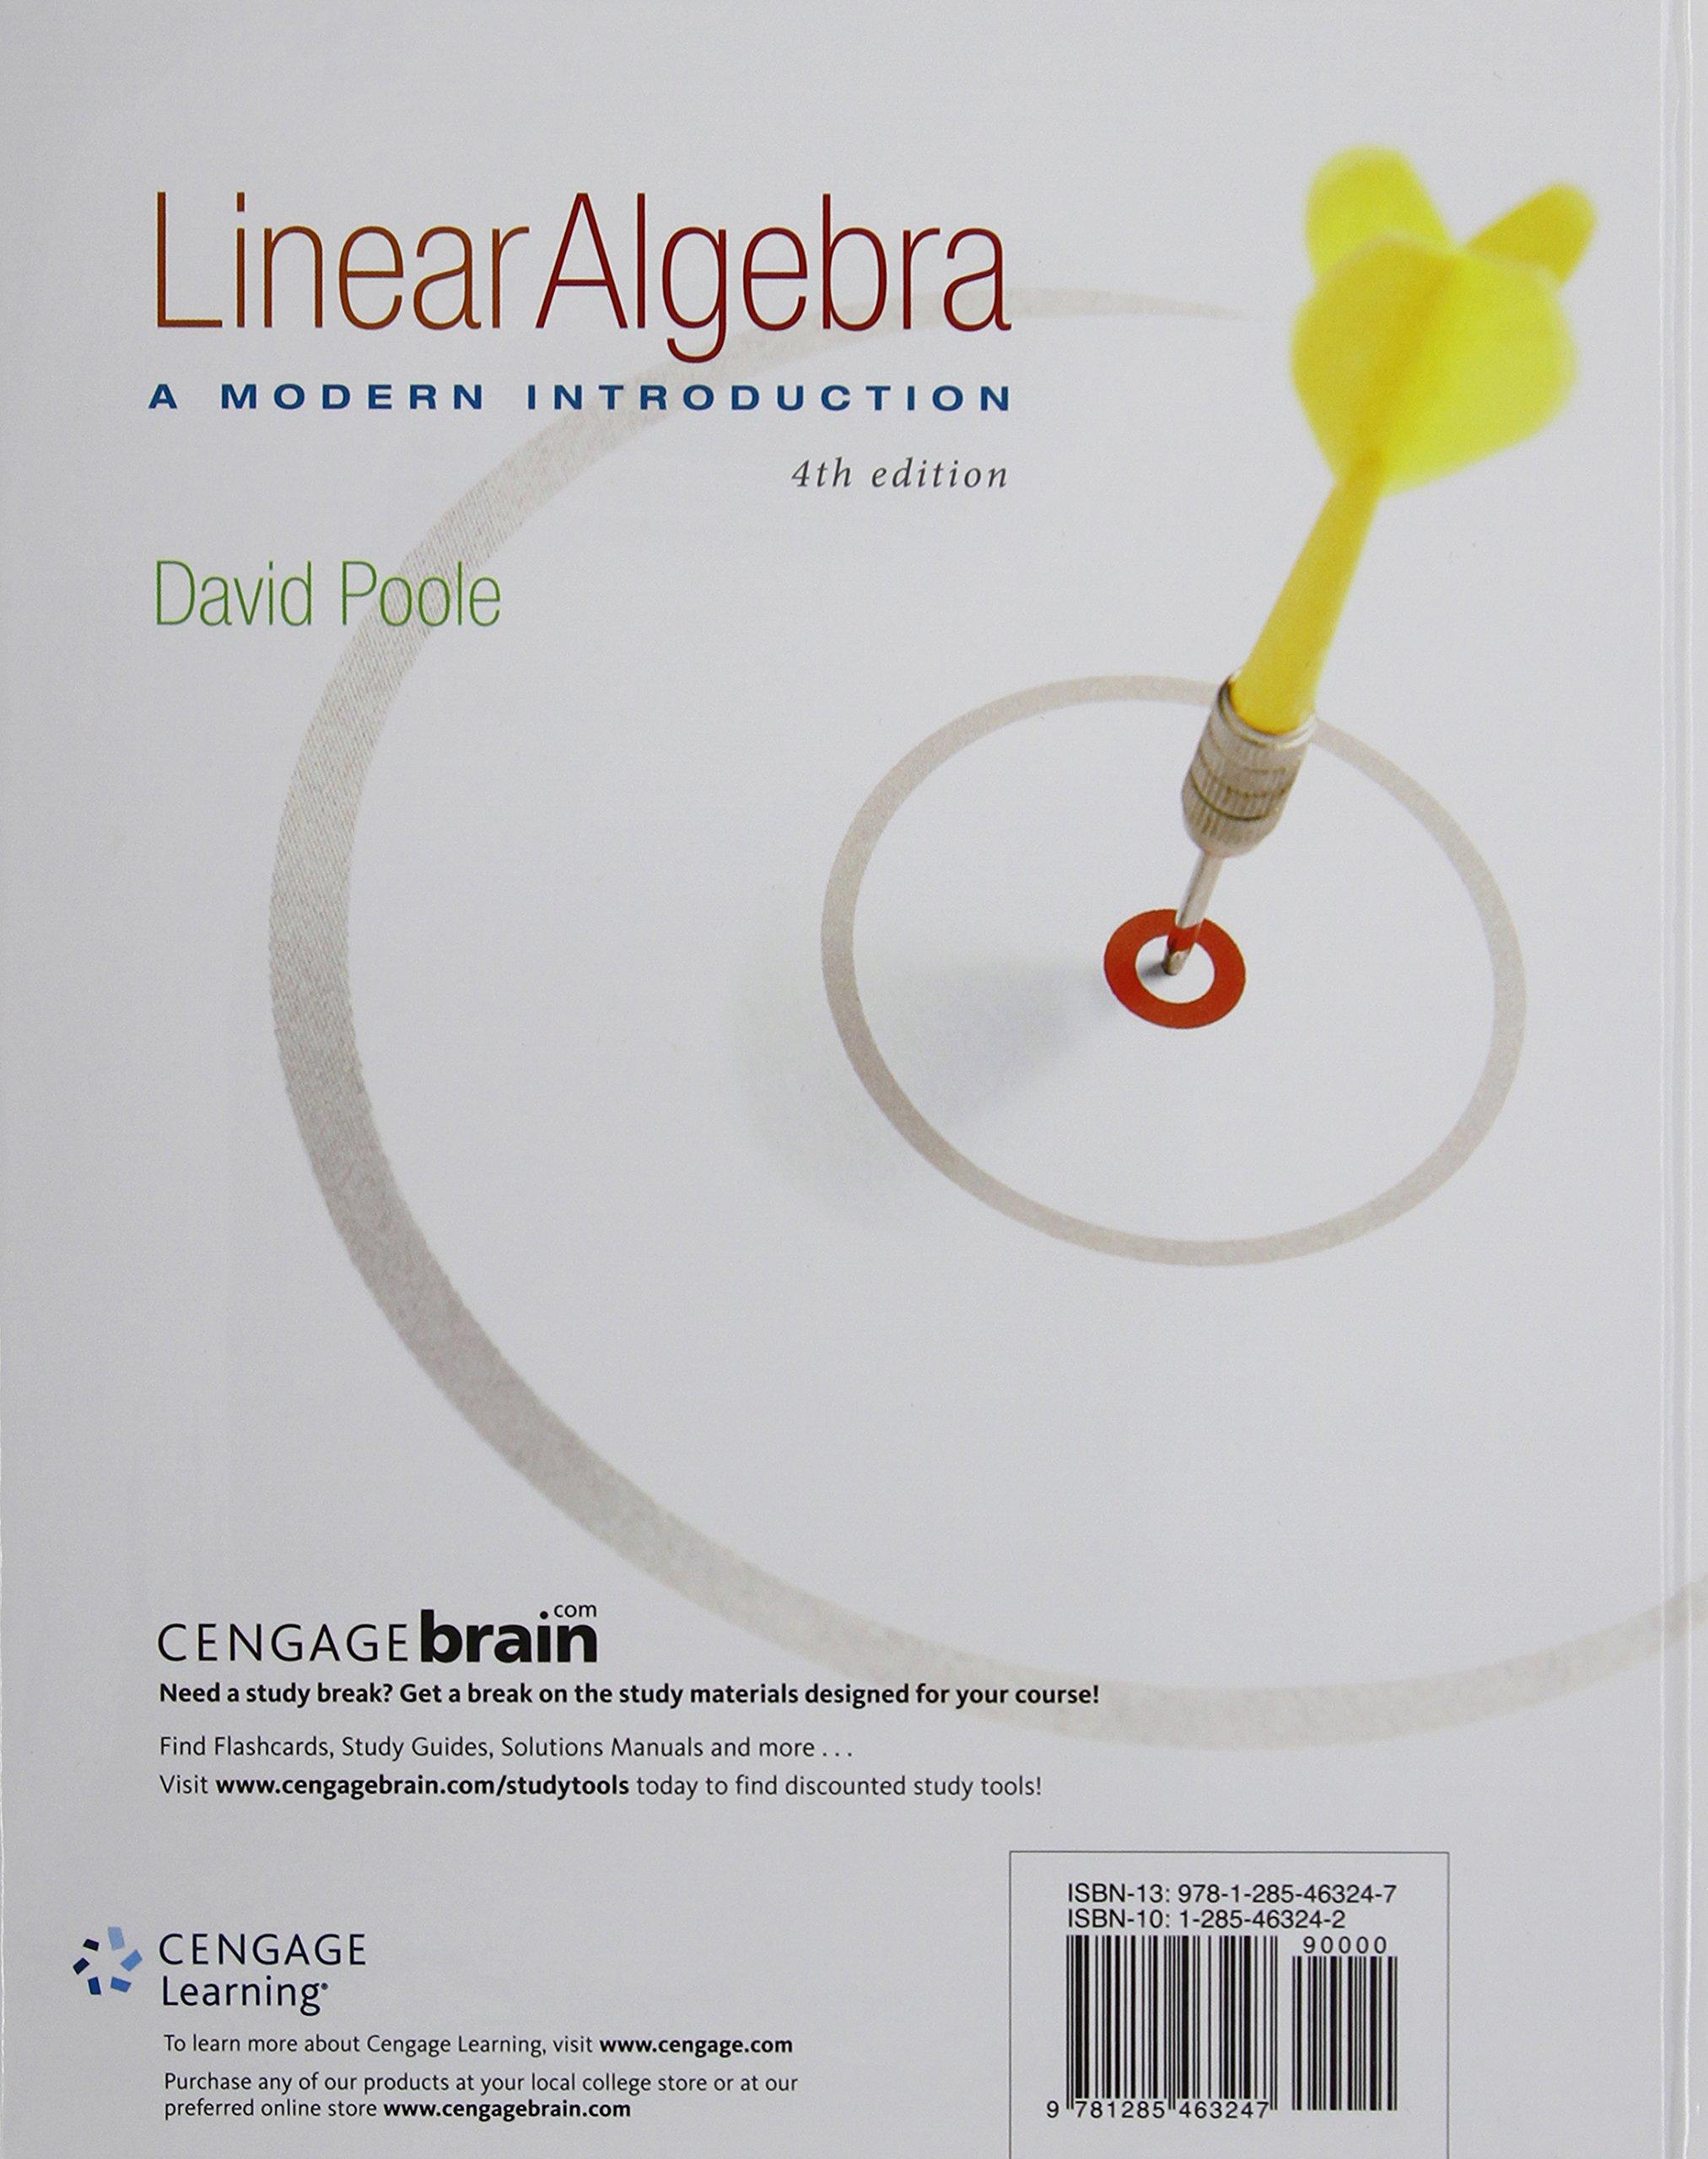 Linear Algebra: A Modern Introduction: David Poole: 8601421990653: Books -  Amazon.ca